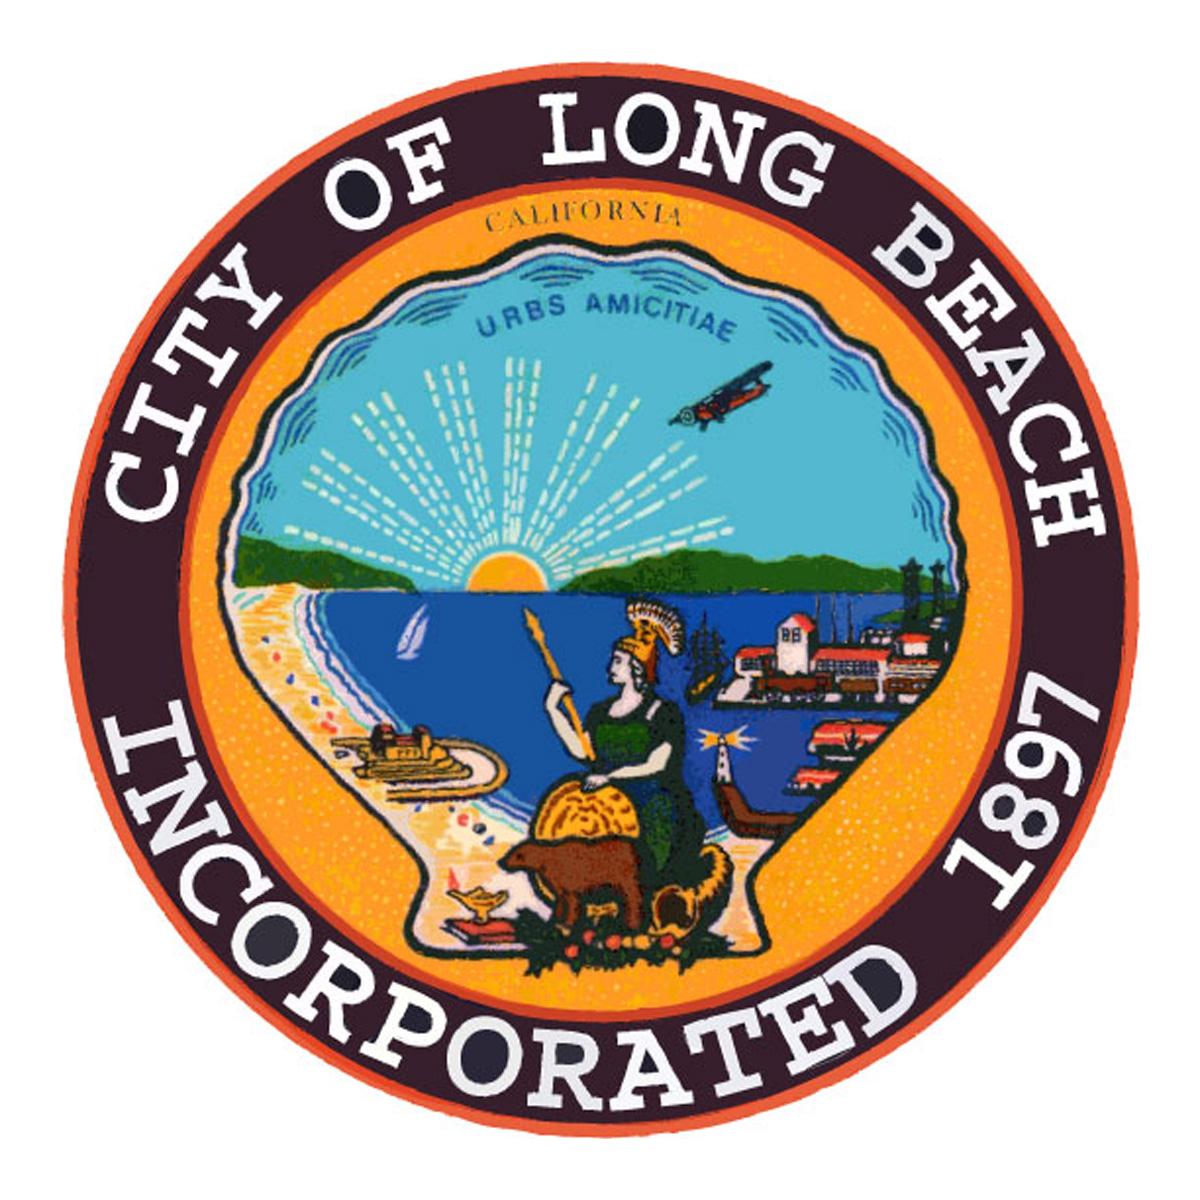 City of Long Beach Workplace Training